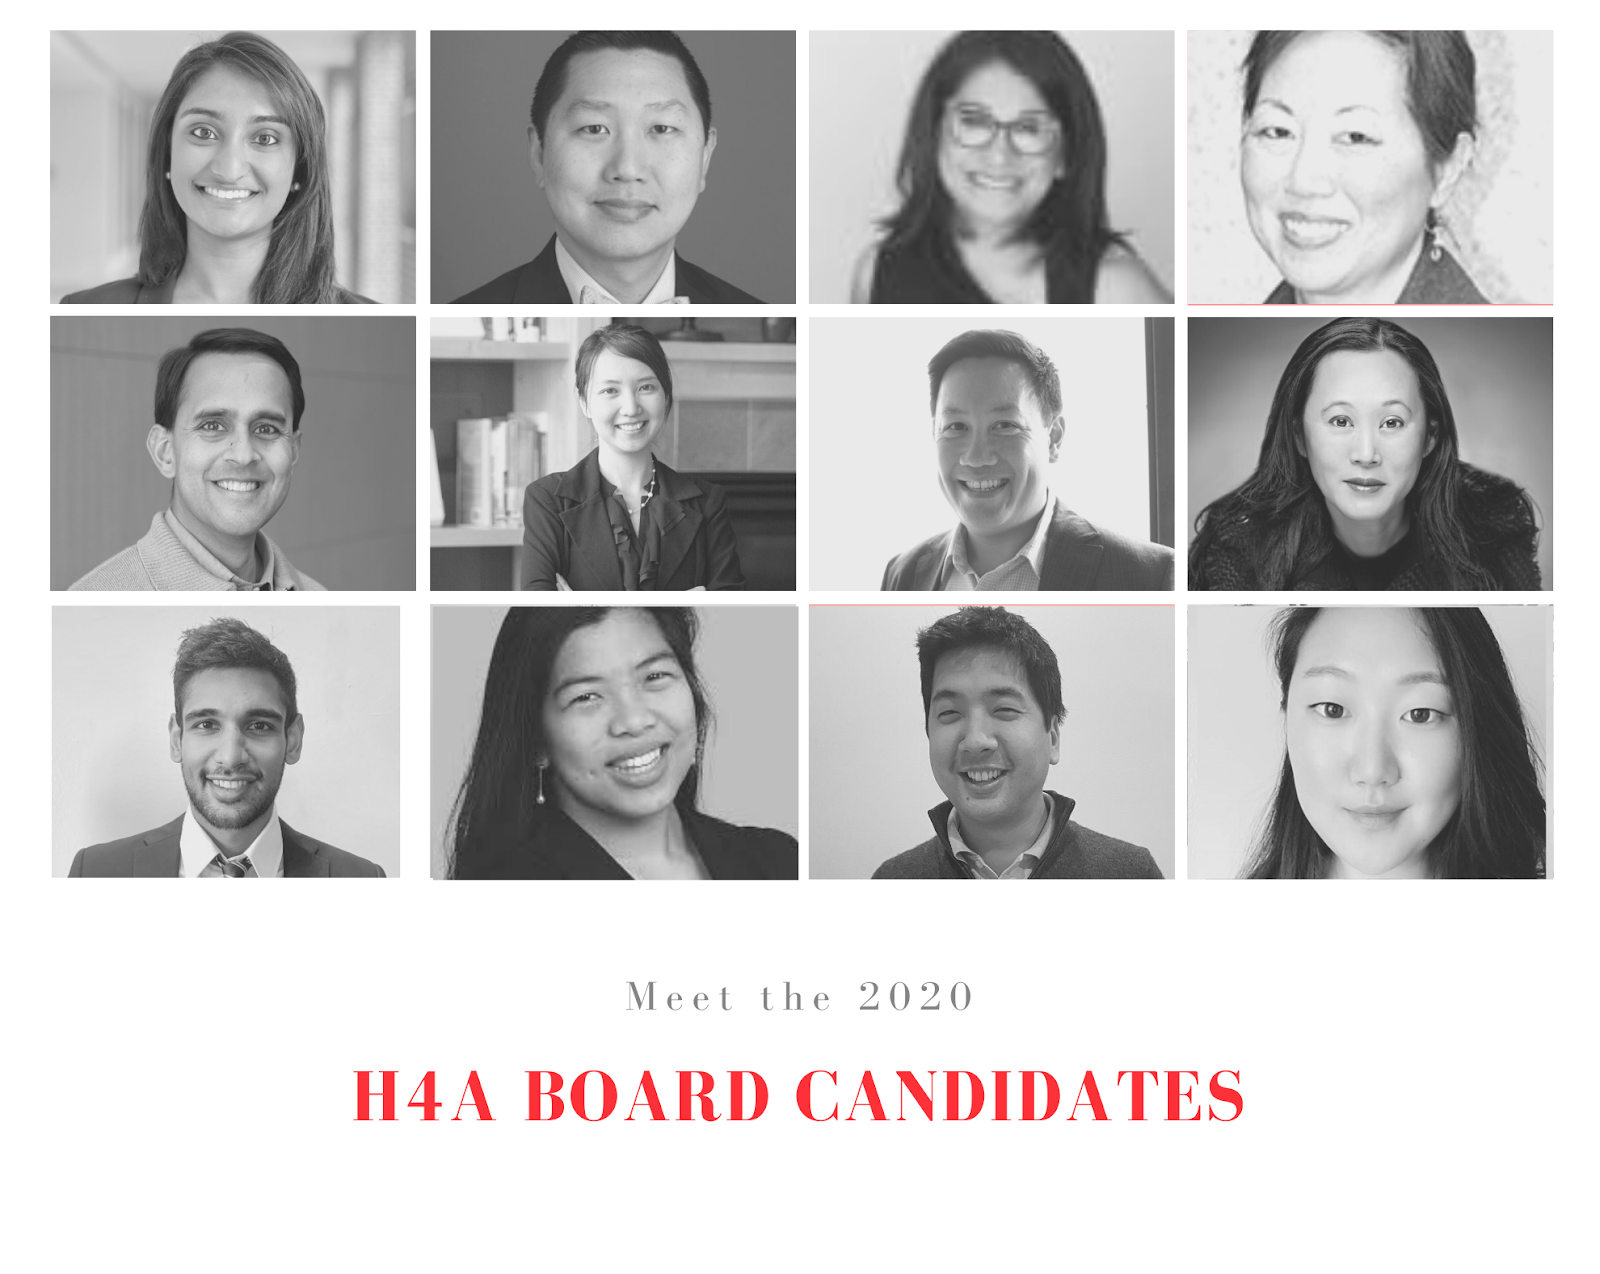 h4a-board-candidates-2020